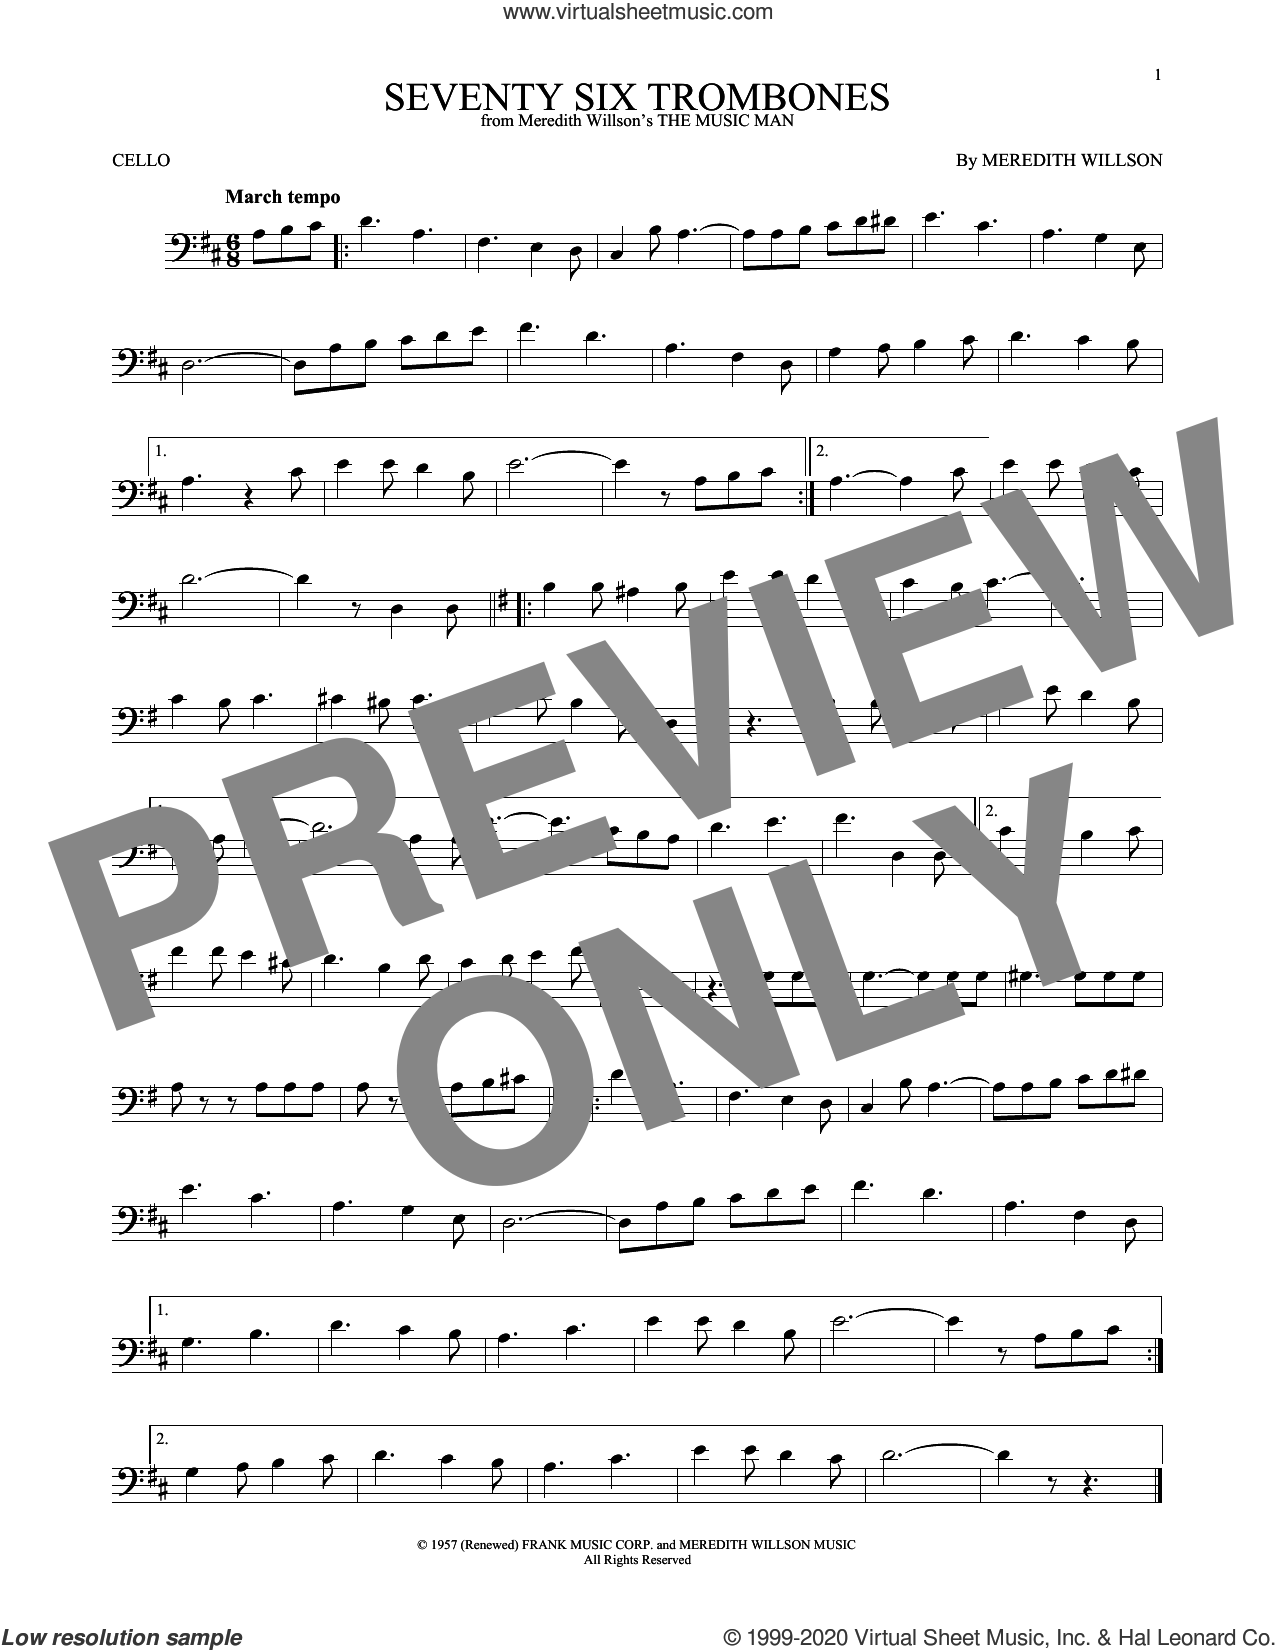 Seventy Six Trombones sheet music for cello solo by Meredith Willson, intermediate skill level